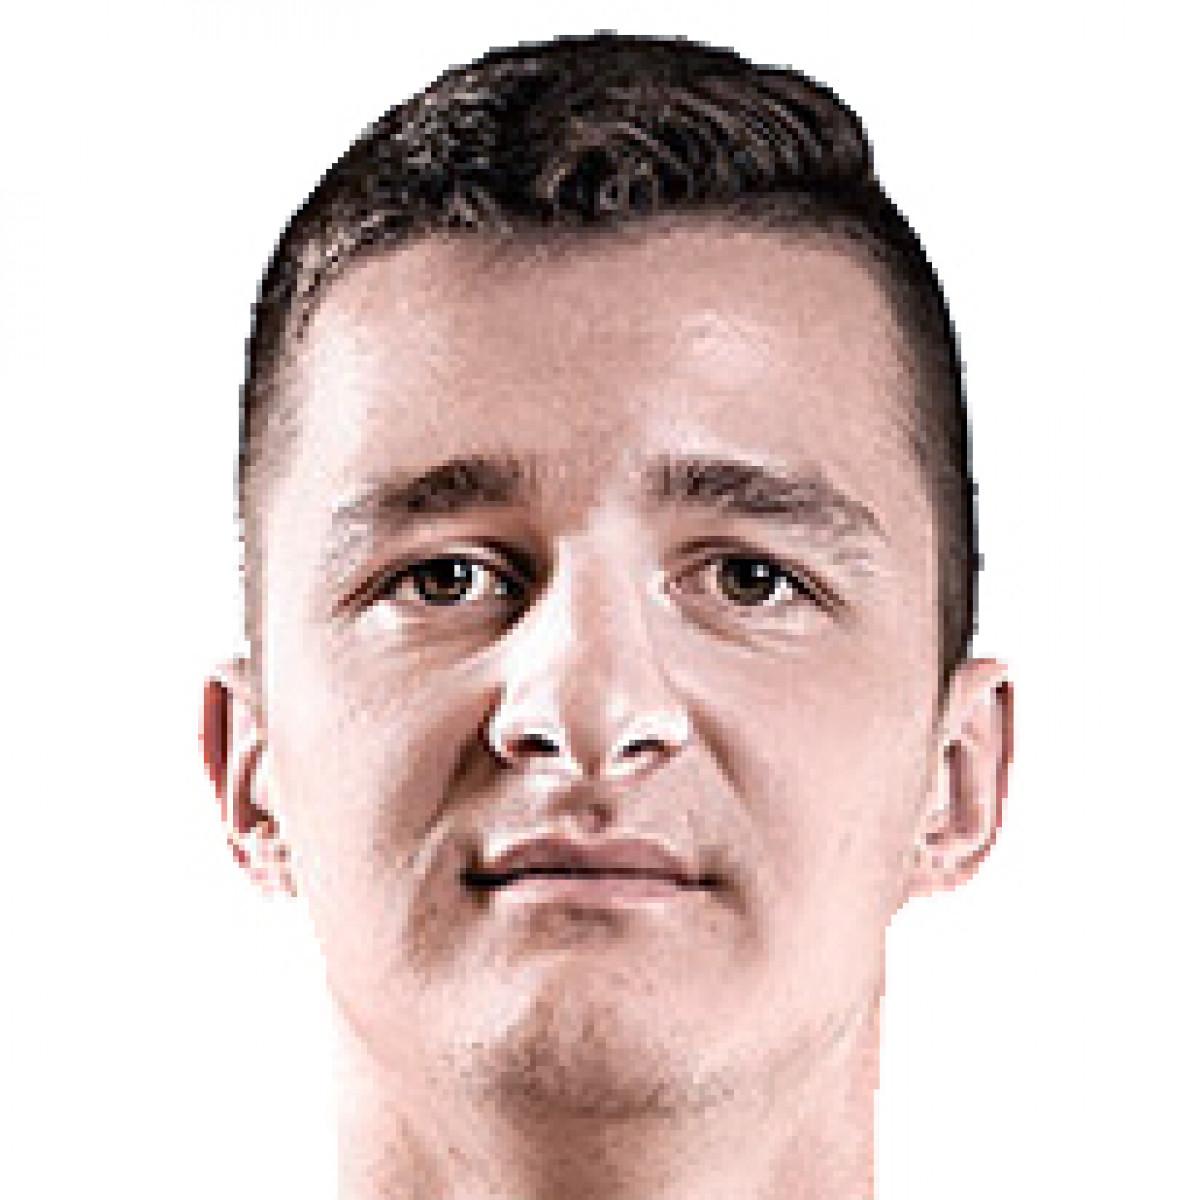 Mateusz Stawiak